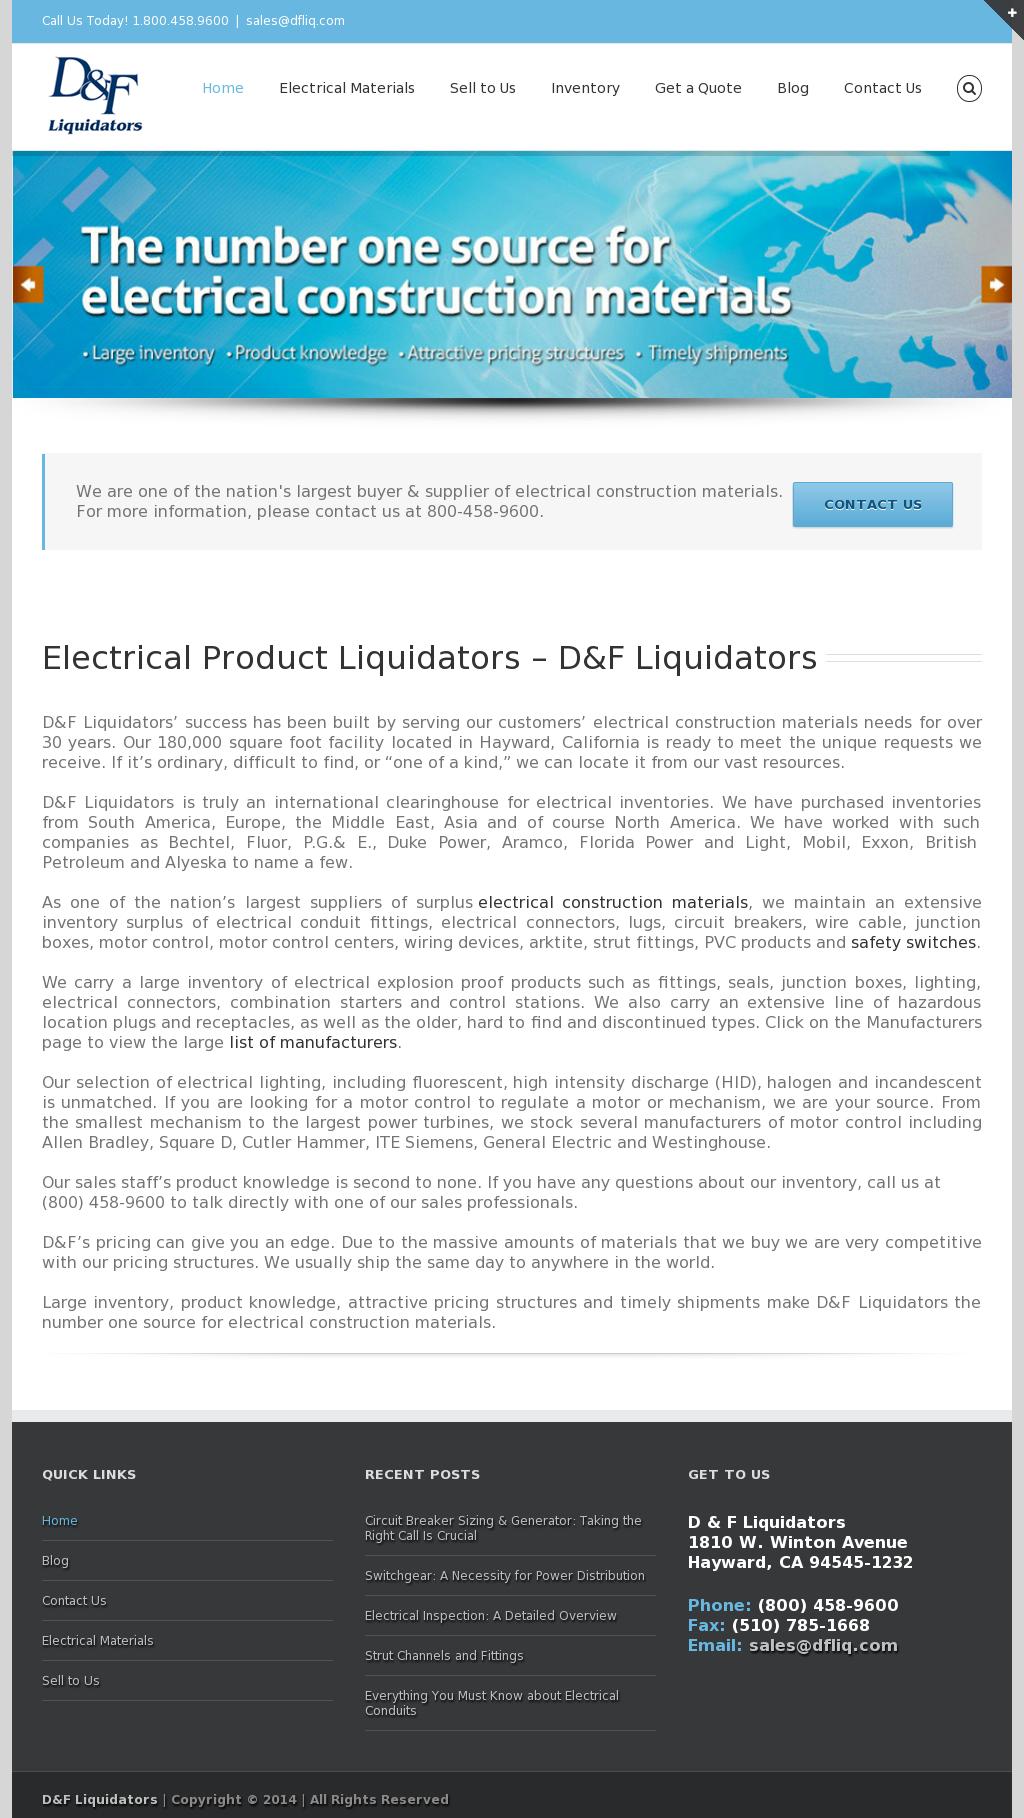 D&f Liquidators Competitors, Revenue and Employees - Owler